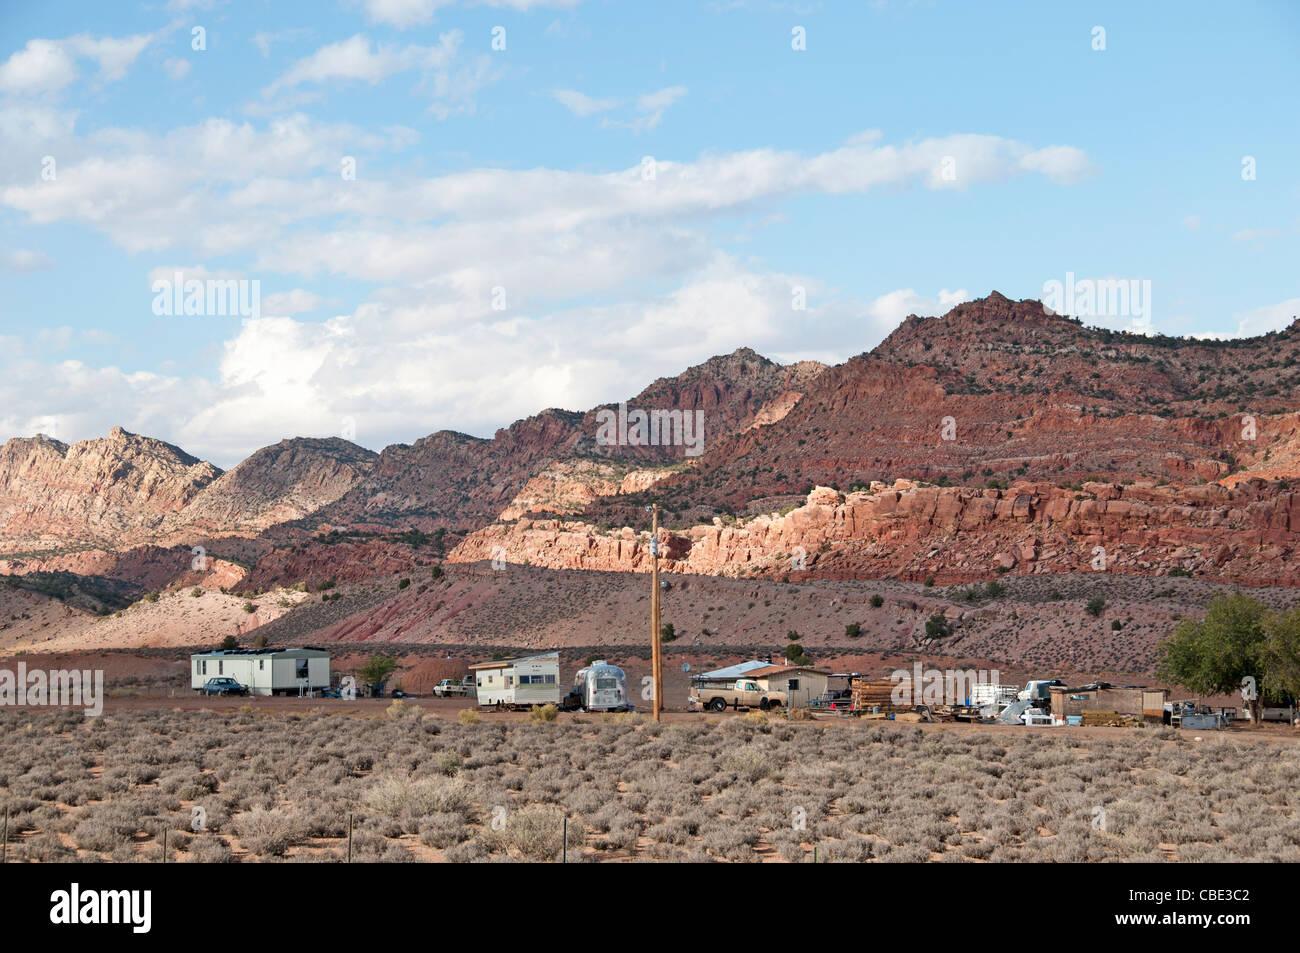 Village Mobile Home Trailer Park near Page Arizona United States - Stock Image